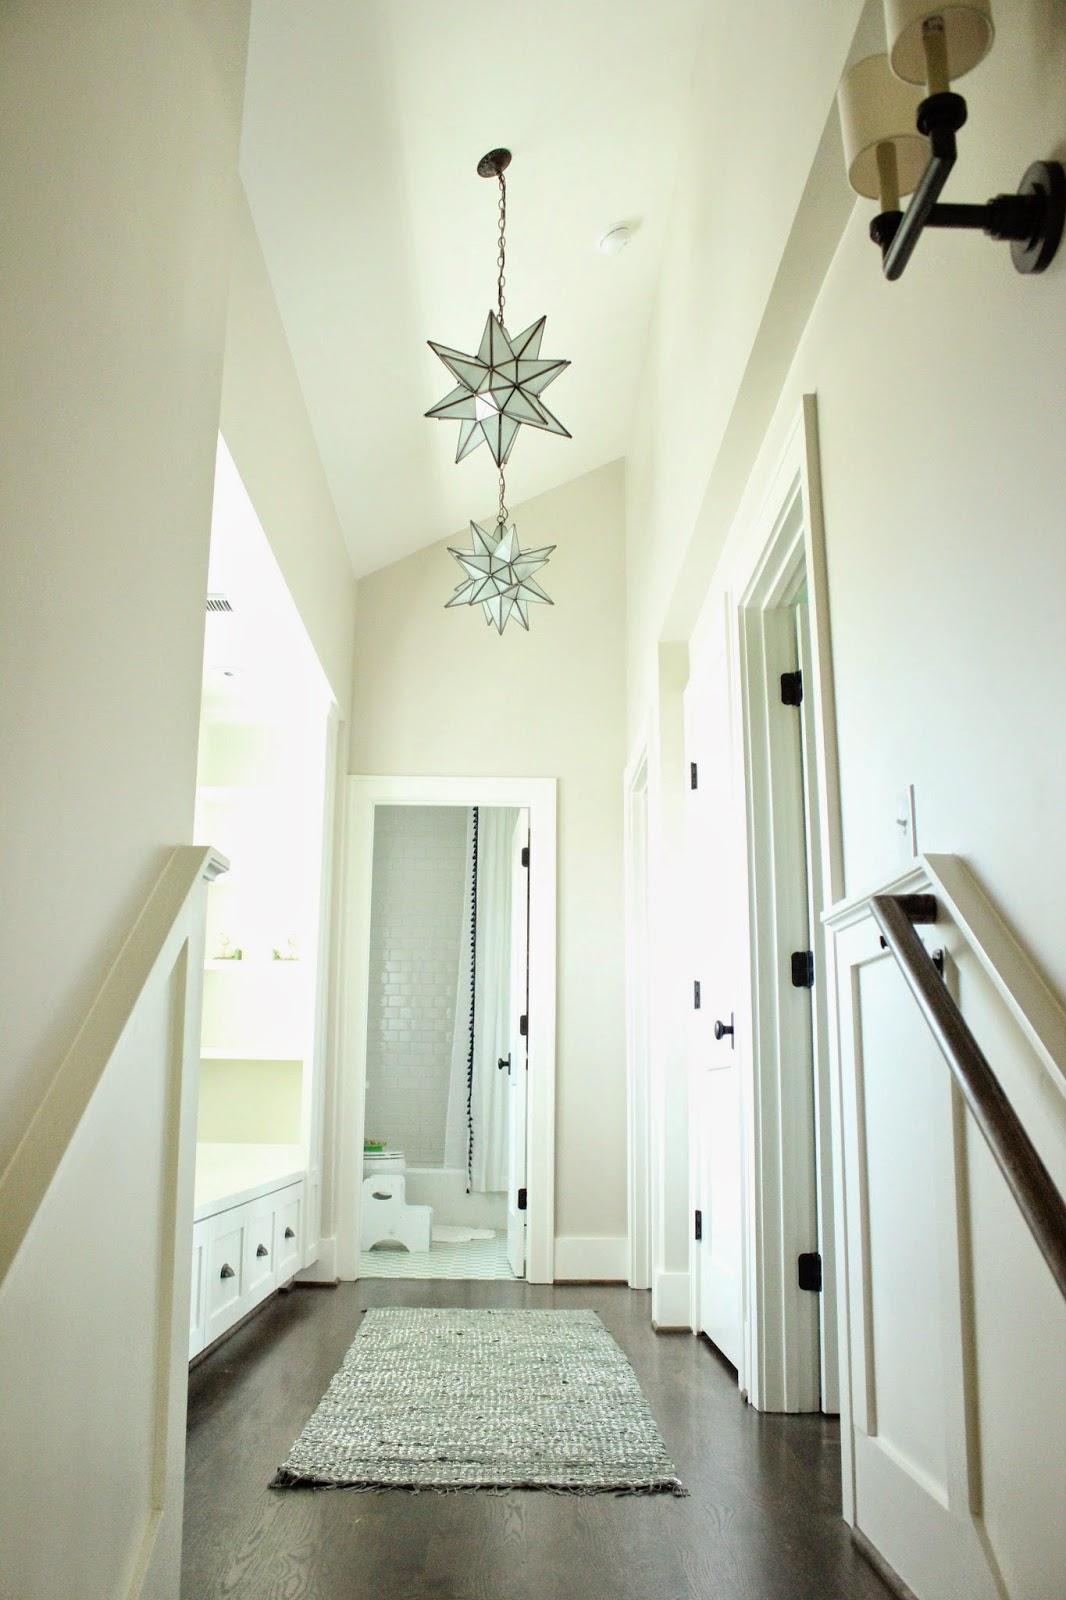 Hanging Star Pendant Light